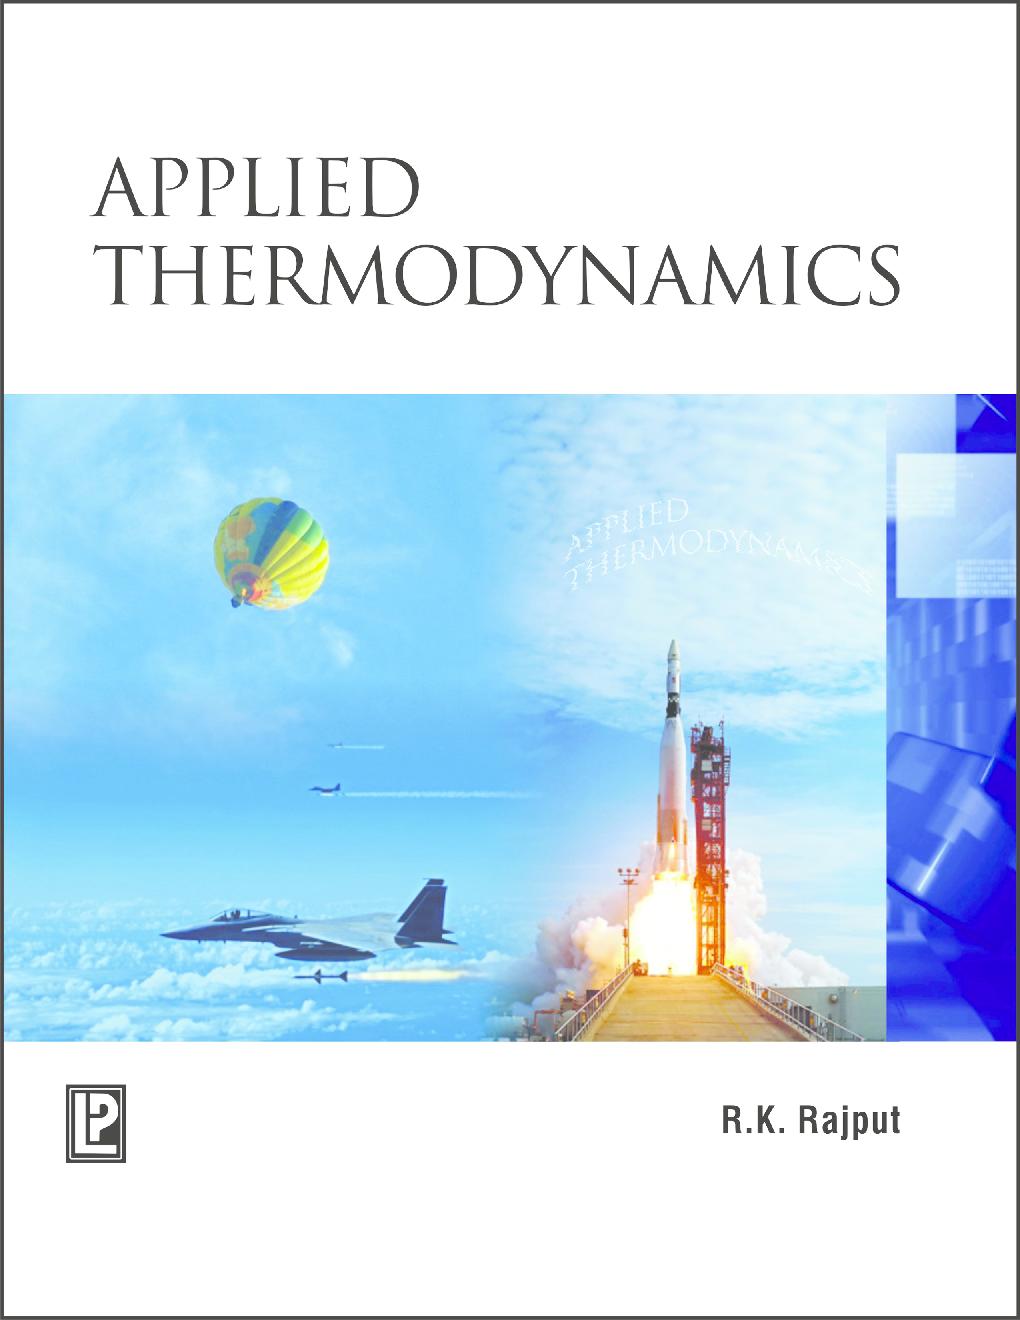 Applied Thermodynamics By Er. R.K.Rajput - Page 1